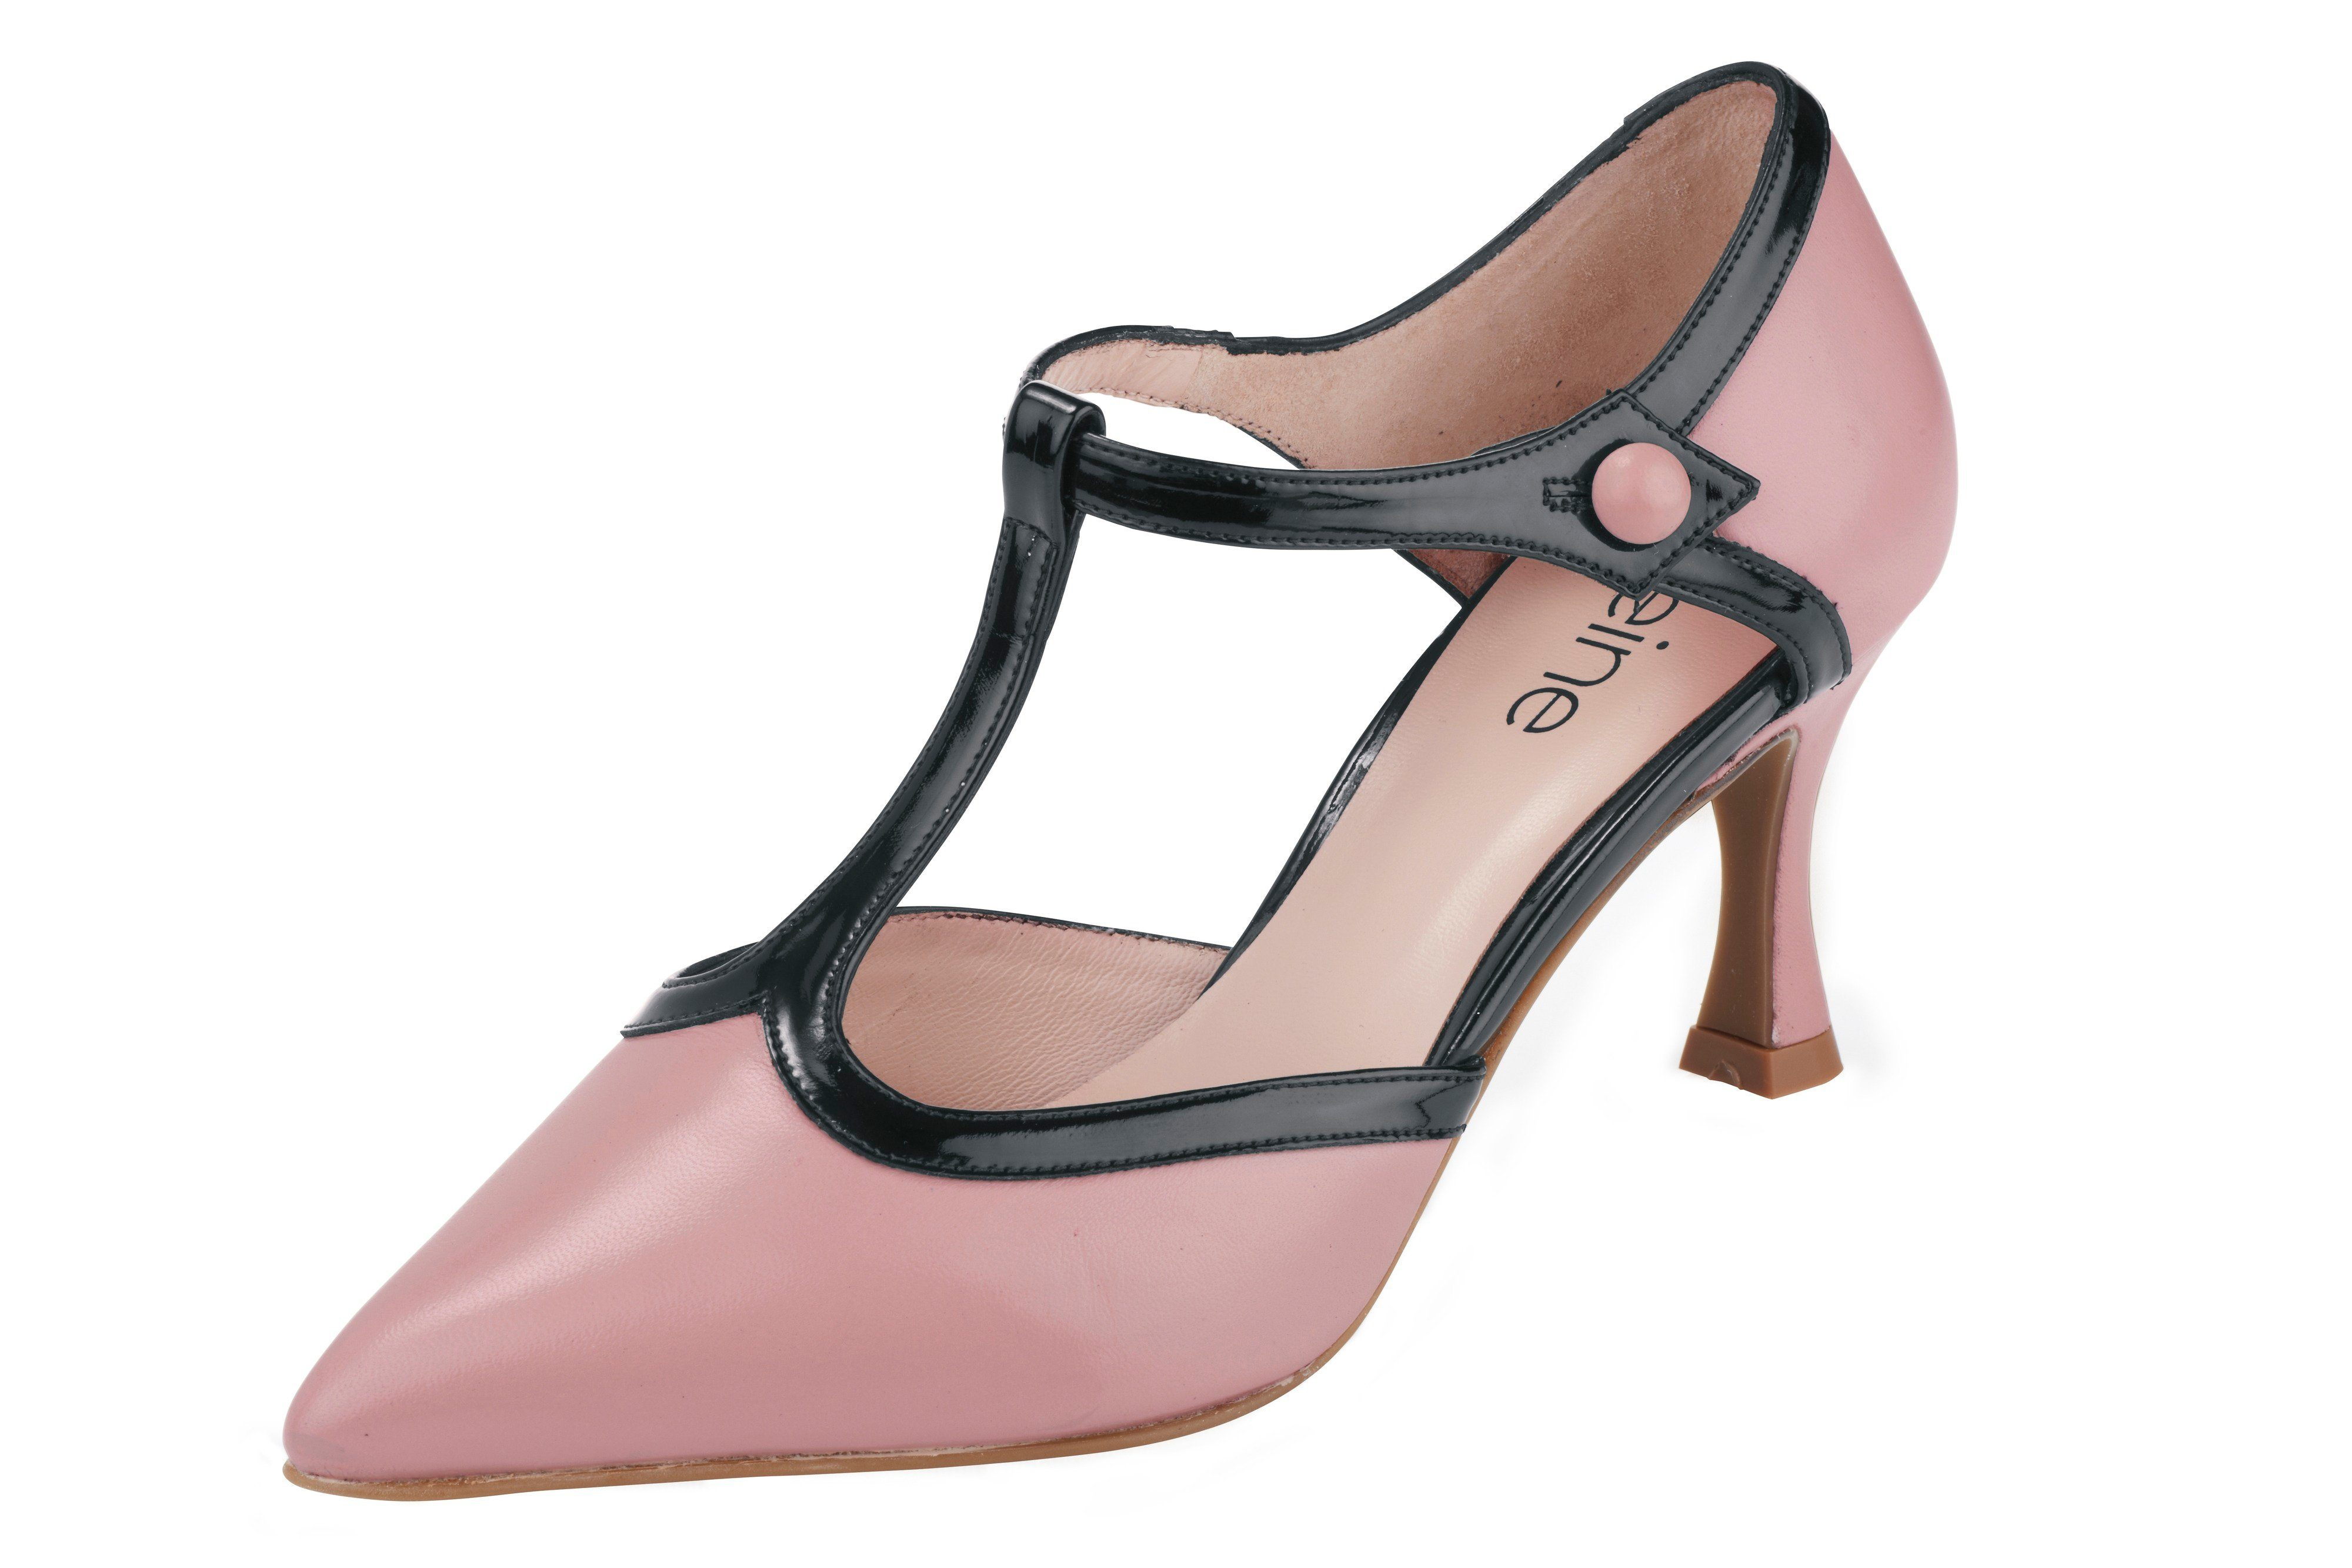 heine Heine Pumps Lackstrucktur, rosa, rosé